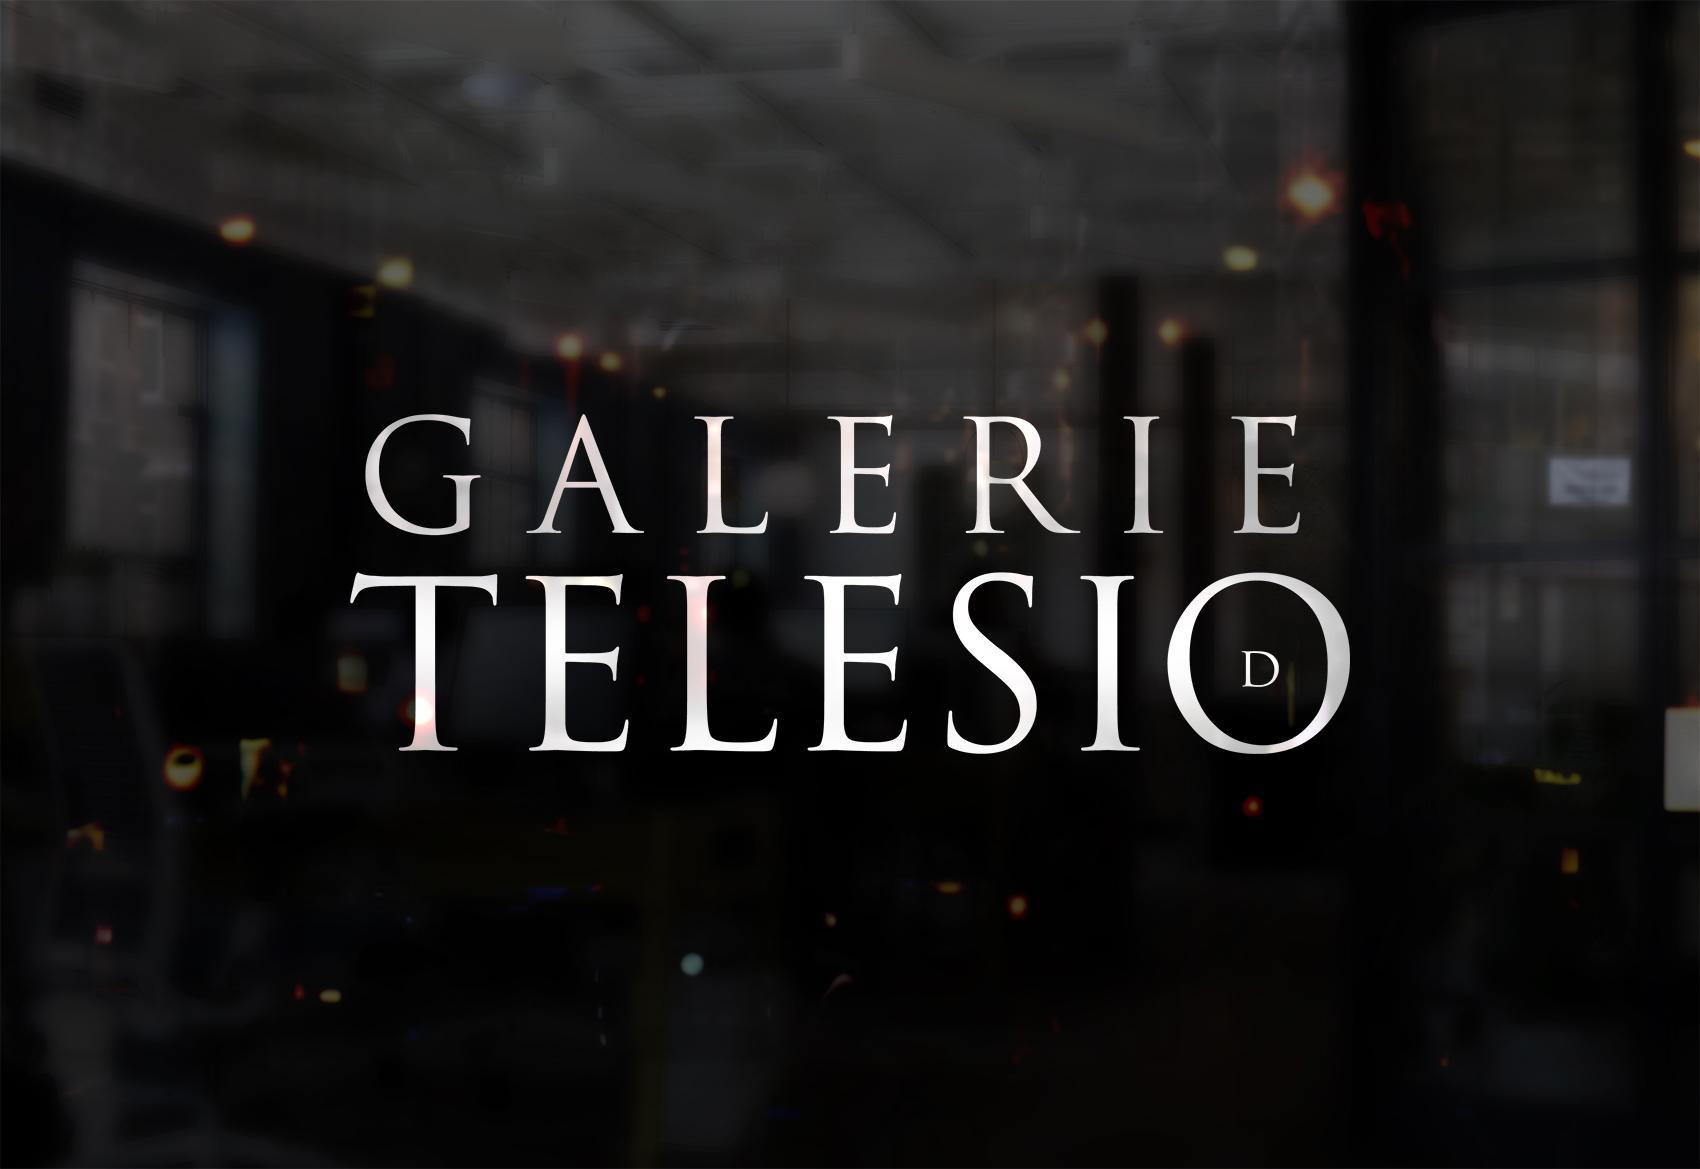 Galerie telesio logotype